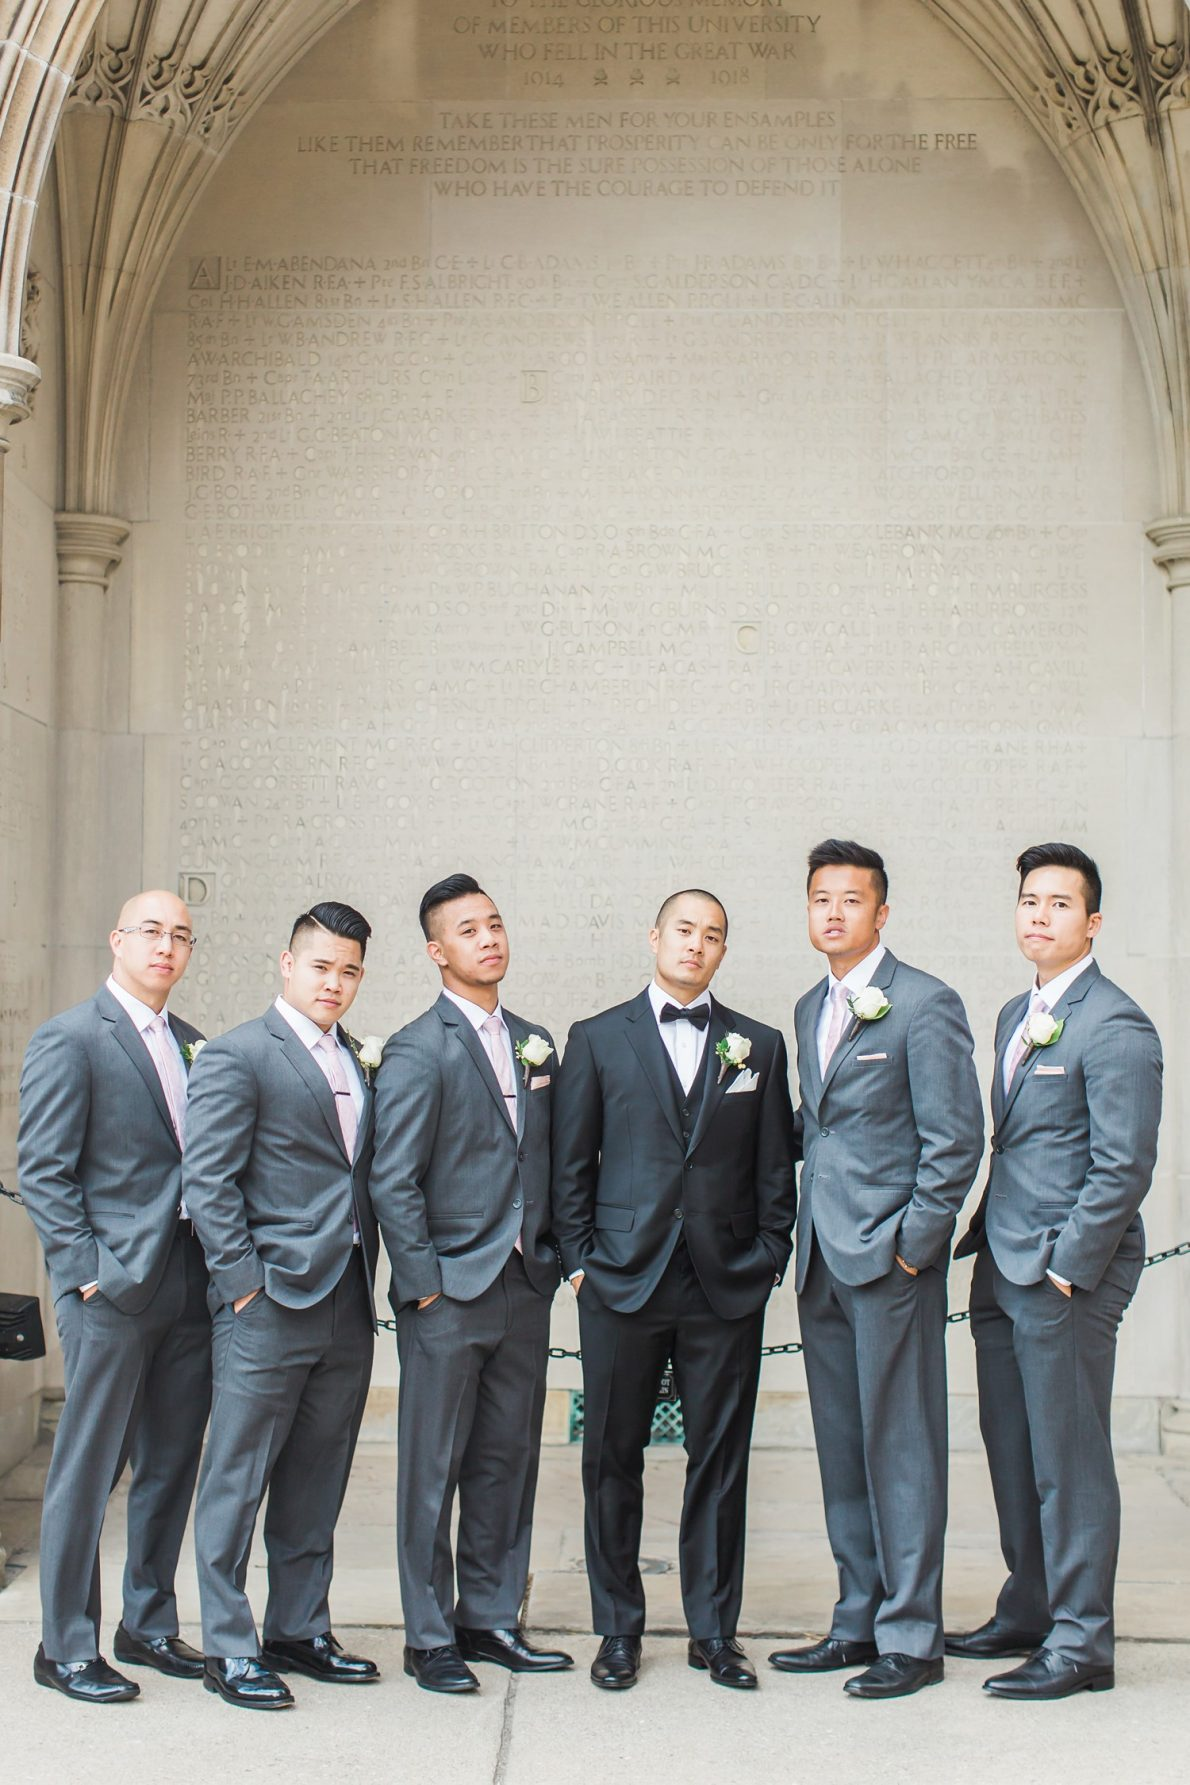 Cool_Groomsmen_Photo_University_of_Toronto_Liberty_Grand_Wedding_Photos-Rhythm_Photography